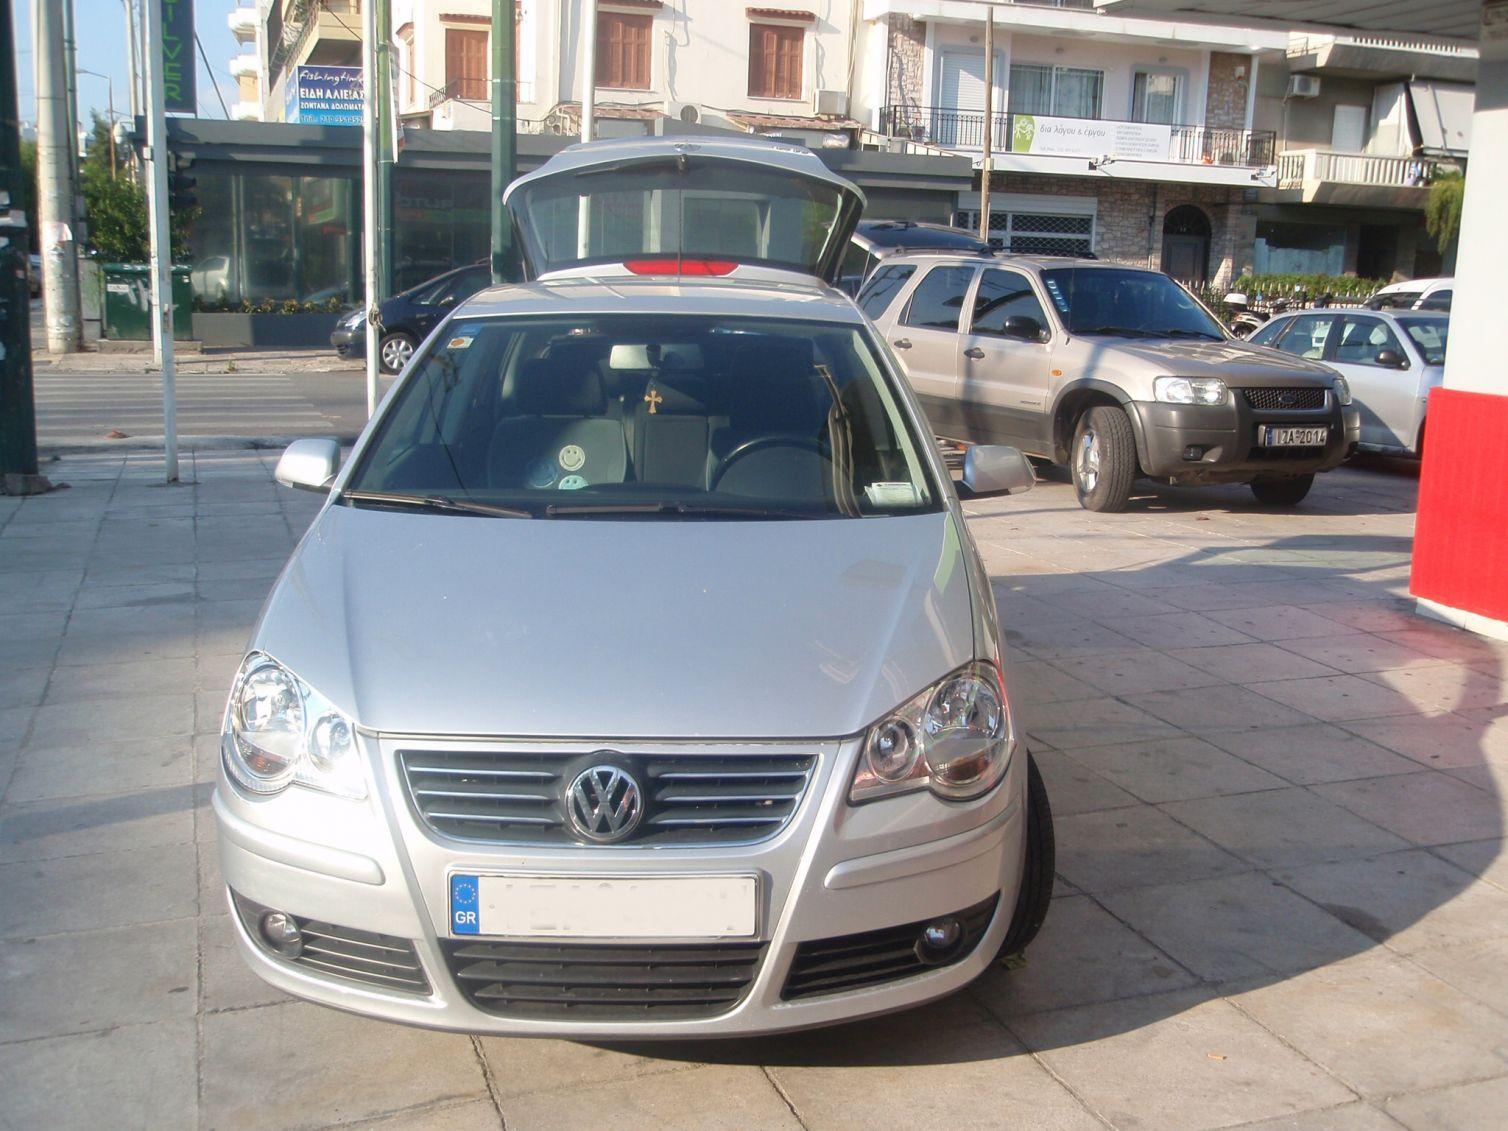 VW POLO 1400cc, 9N3 2005 ME BRC 43LT